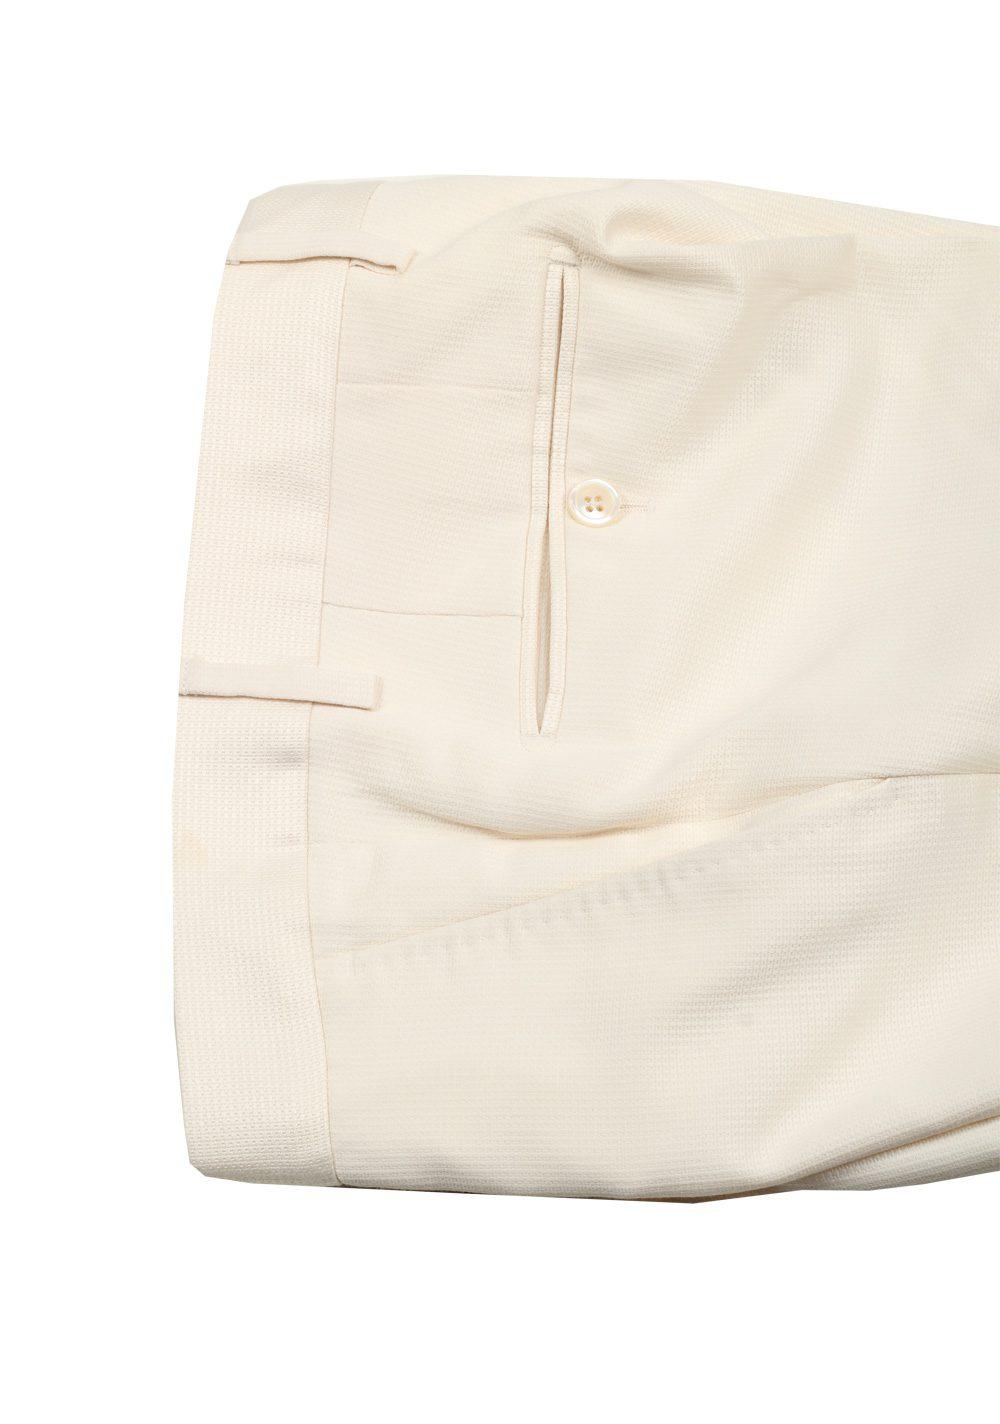 TOM FORD Buckley Off White Suit Size 48 / 38R U.S. Silk Cotton | Costume Limité